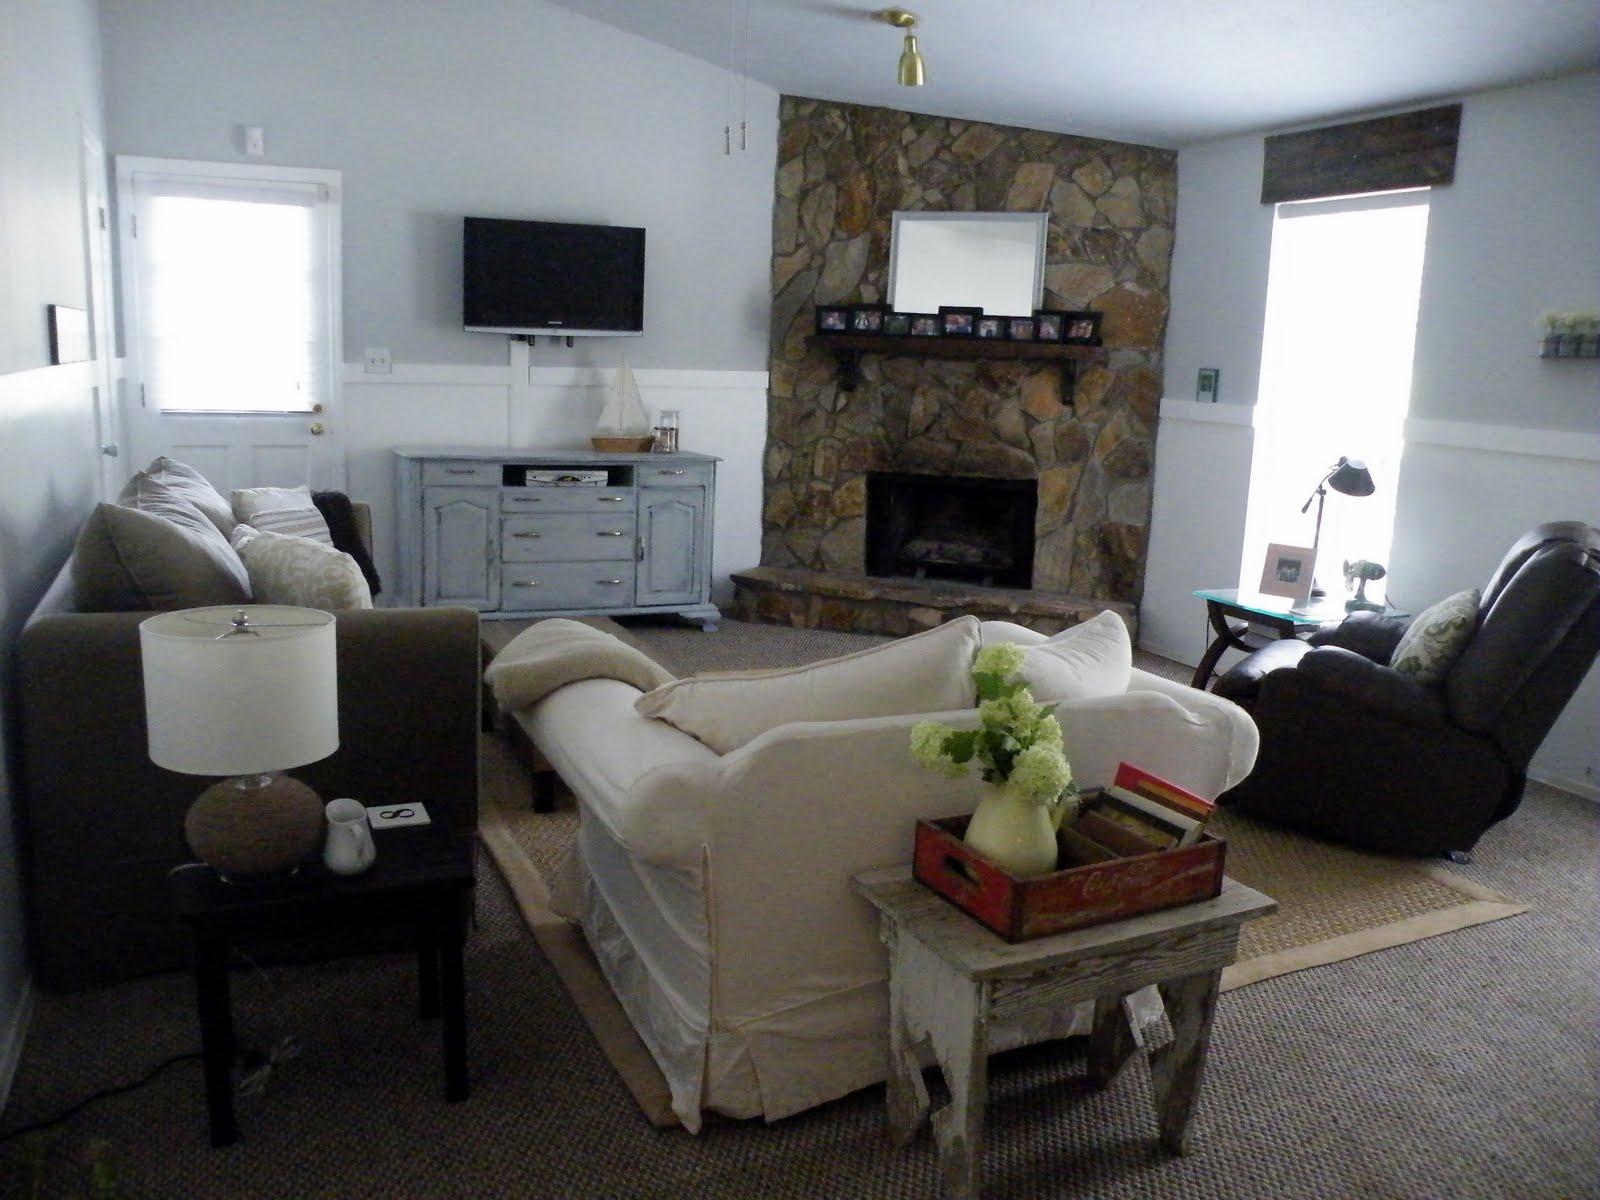 House designs school living room dining room combination - Dining room and living room combined ...